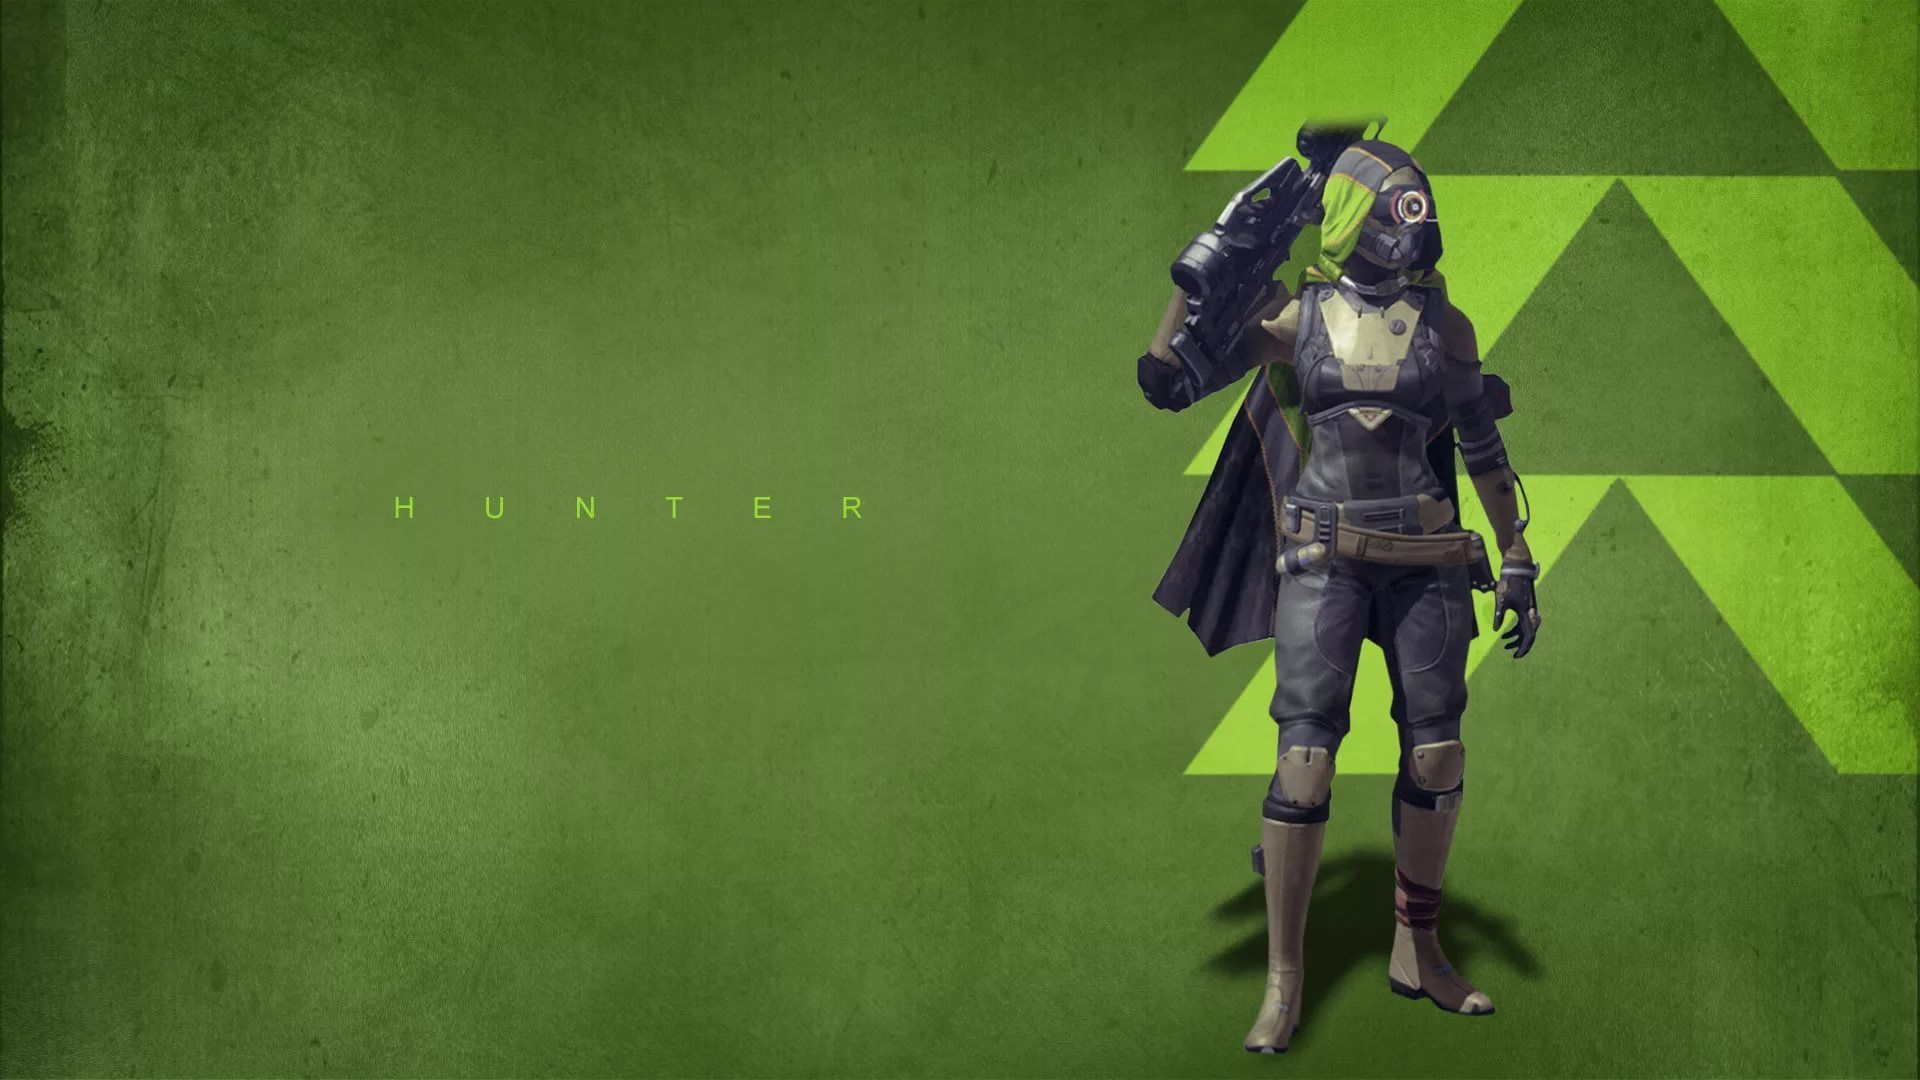 Destiny Hunter new wallpaper